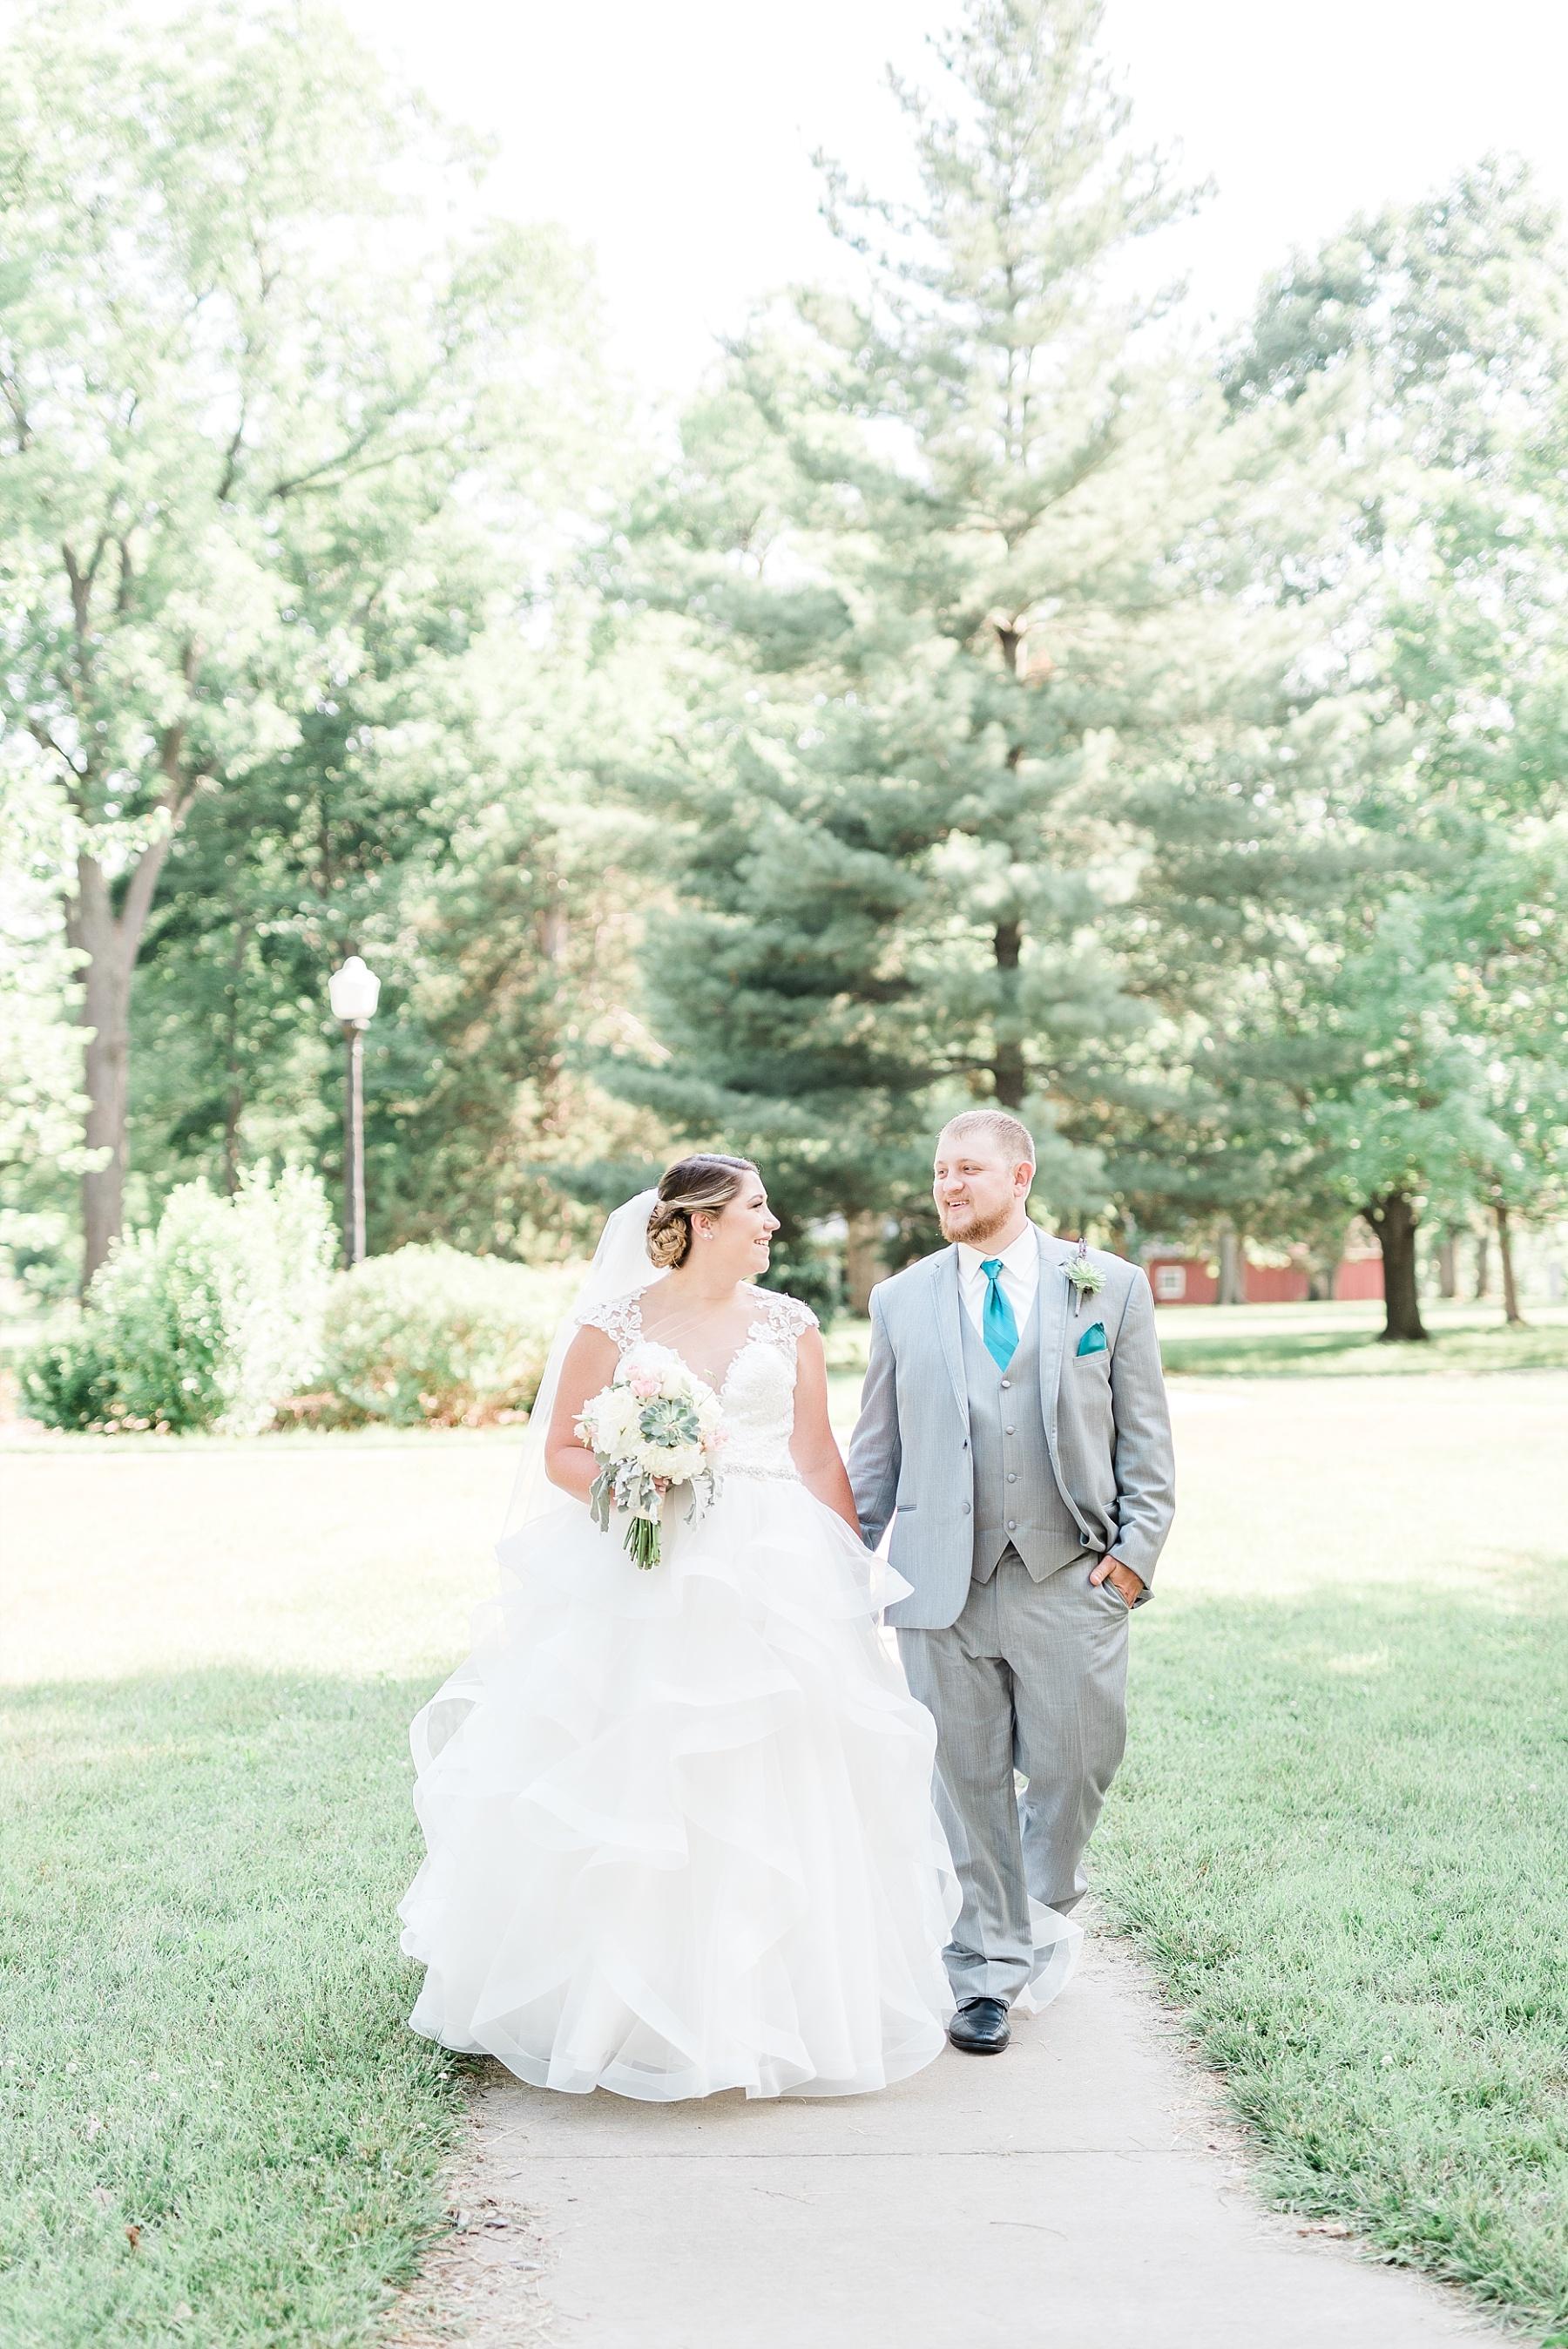 Baurichter Wedding at Stoney Creek Inn Columbia Missouri by Kelsi Kliethermes Photography_0019.jpg